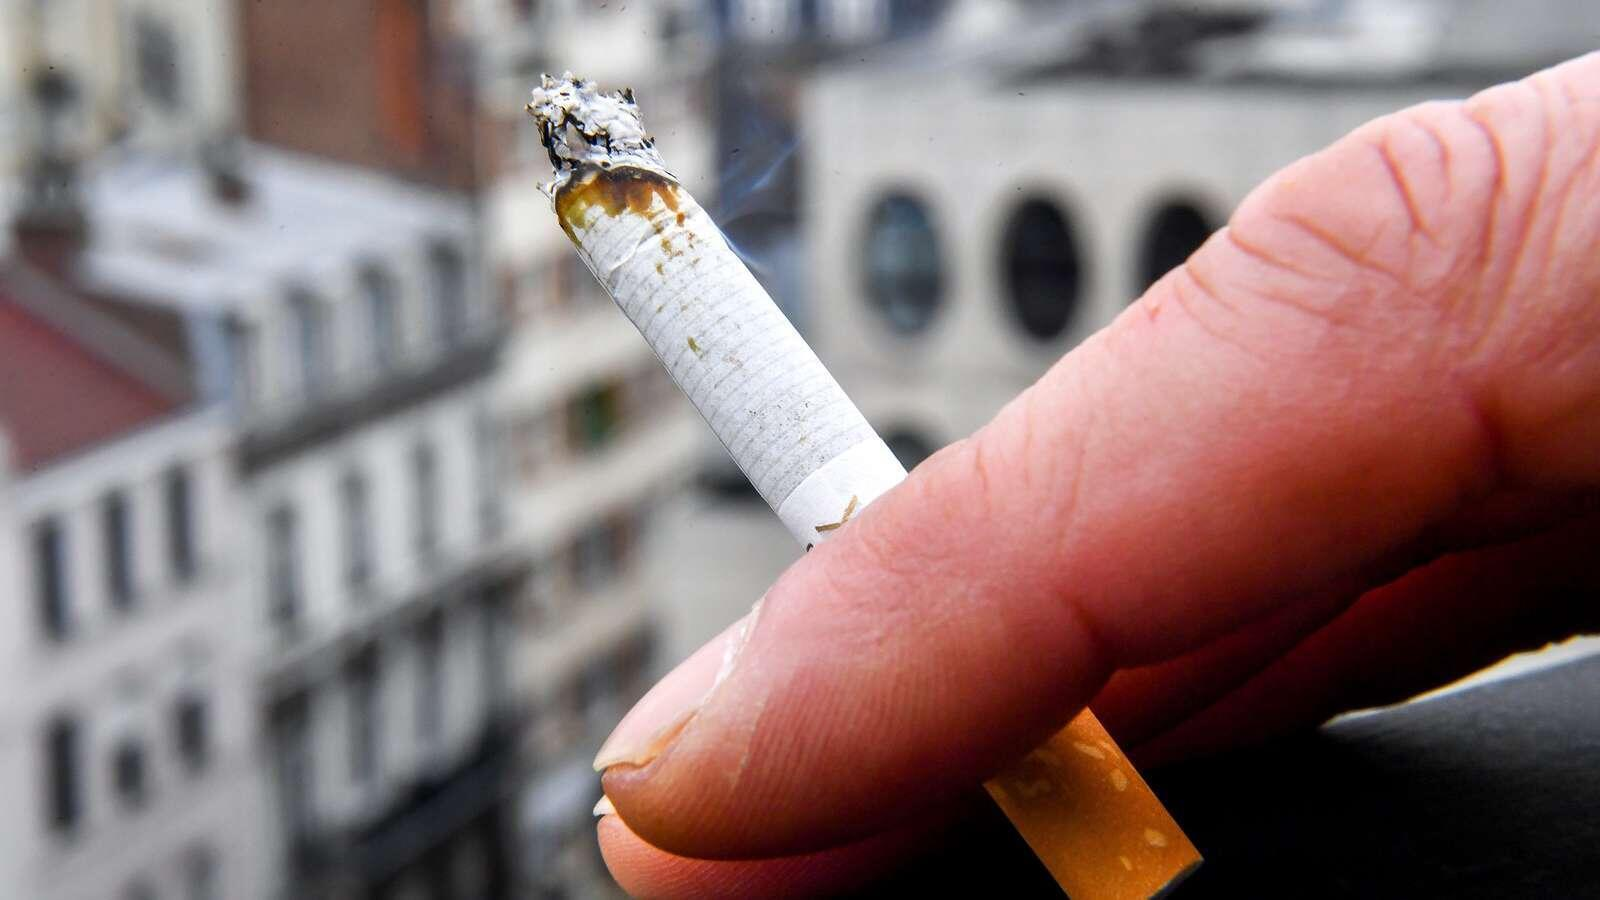 2020-05-13 france health smoking cigarette